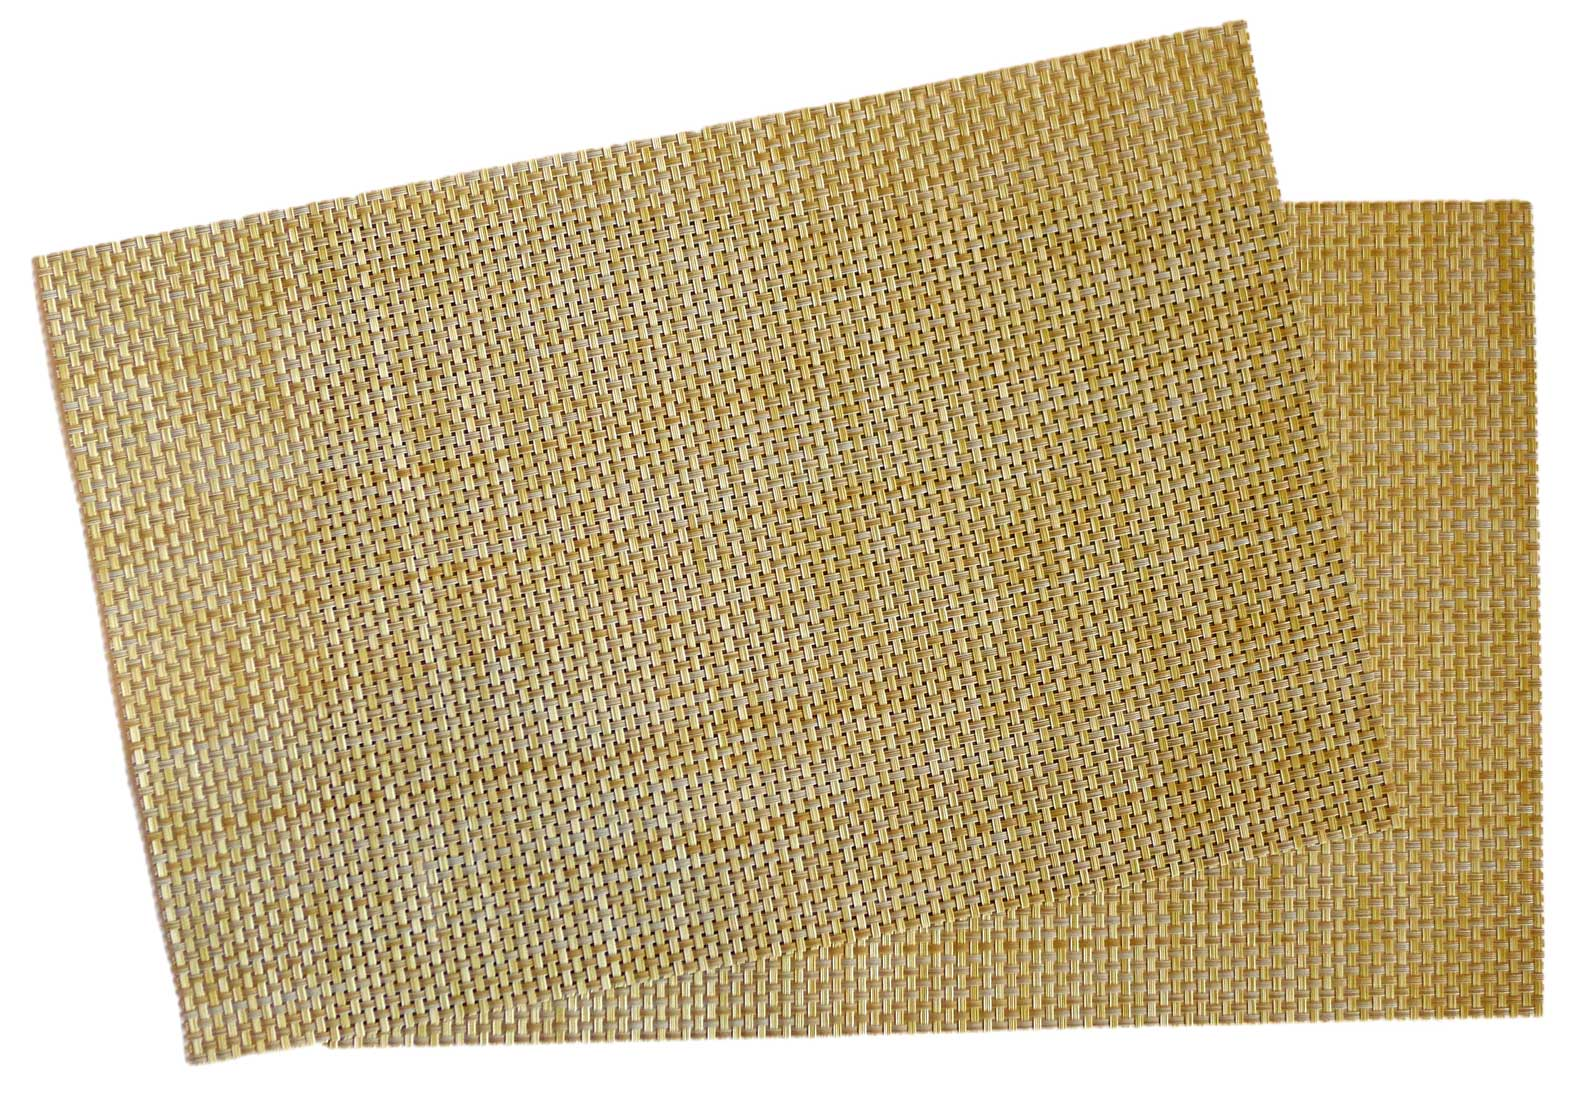 Image of Crossweave Woven Vinyl Placemat, Set of 4 - Light Moss